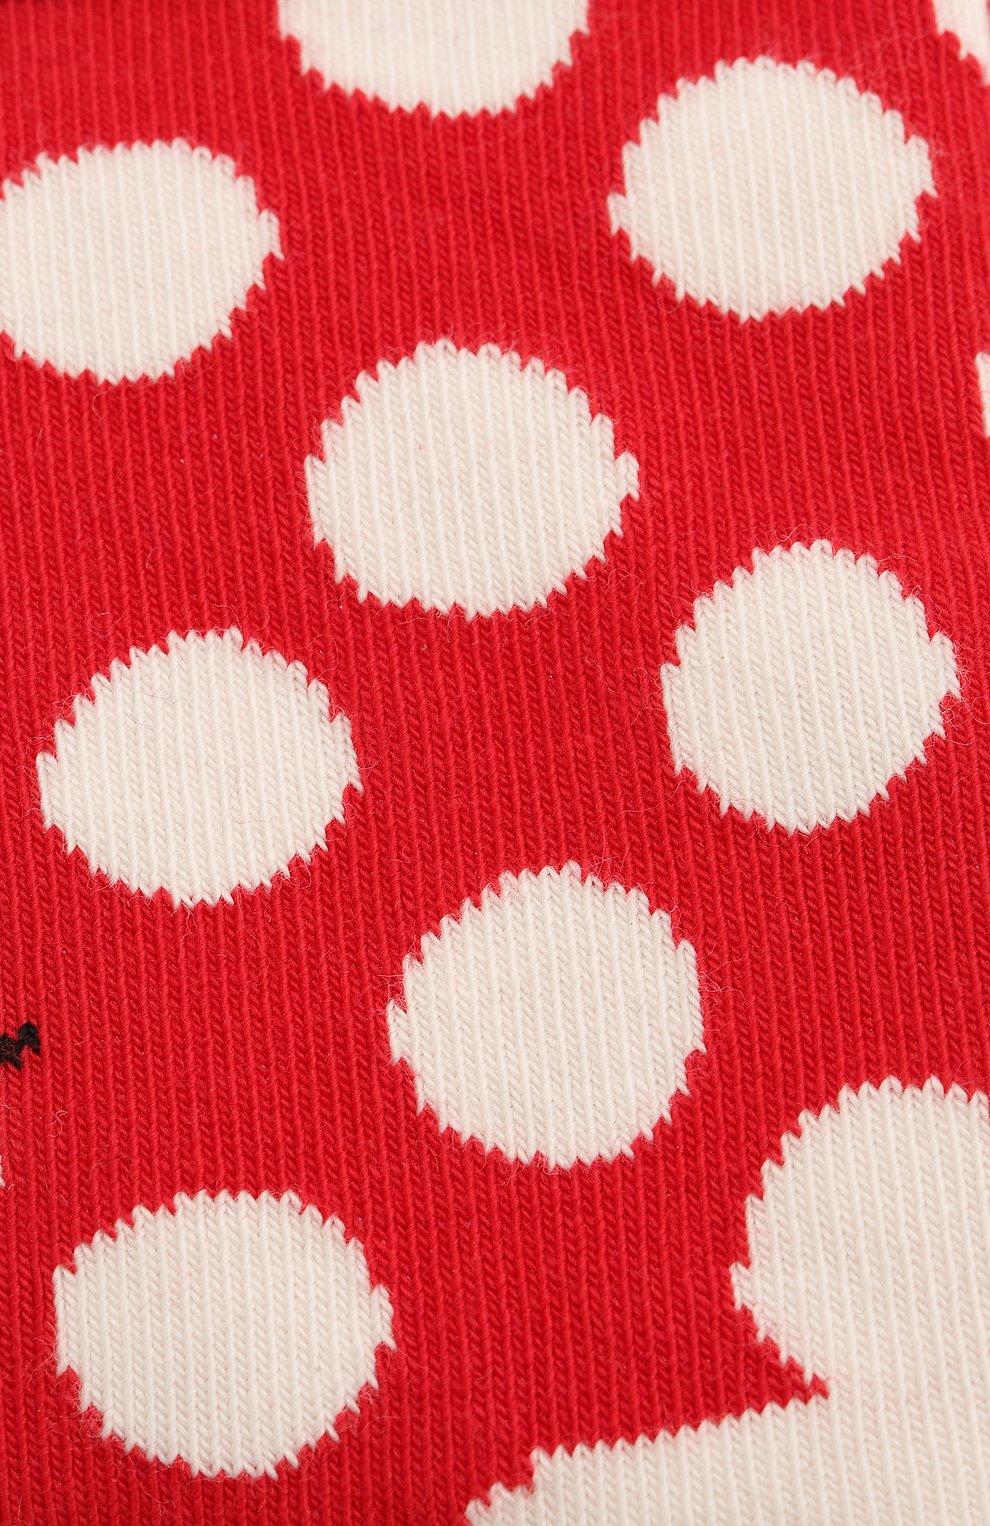 Детские носки HAPPY SOCKS разноцветного цвета, арт. KBDS01 | Фото 2 (Материал: Текстиль, Хлопок)